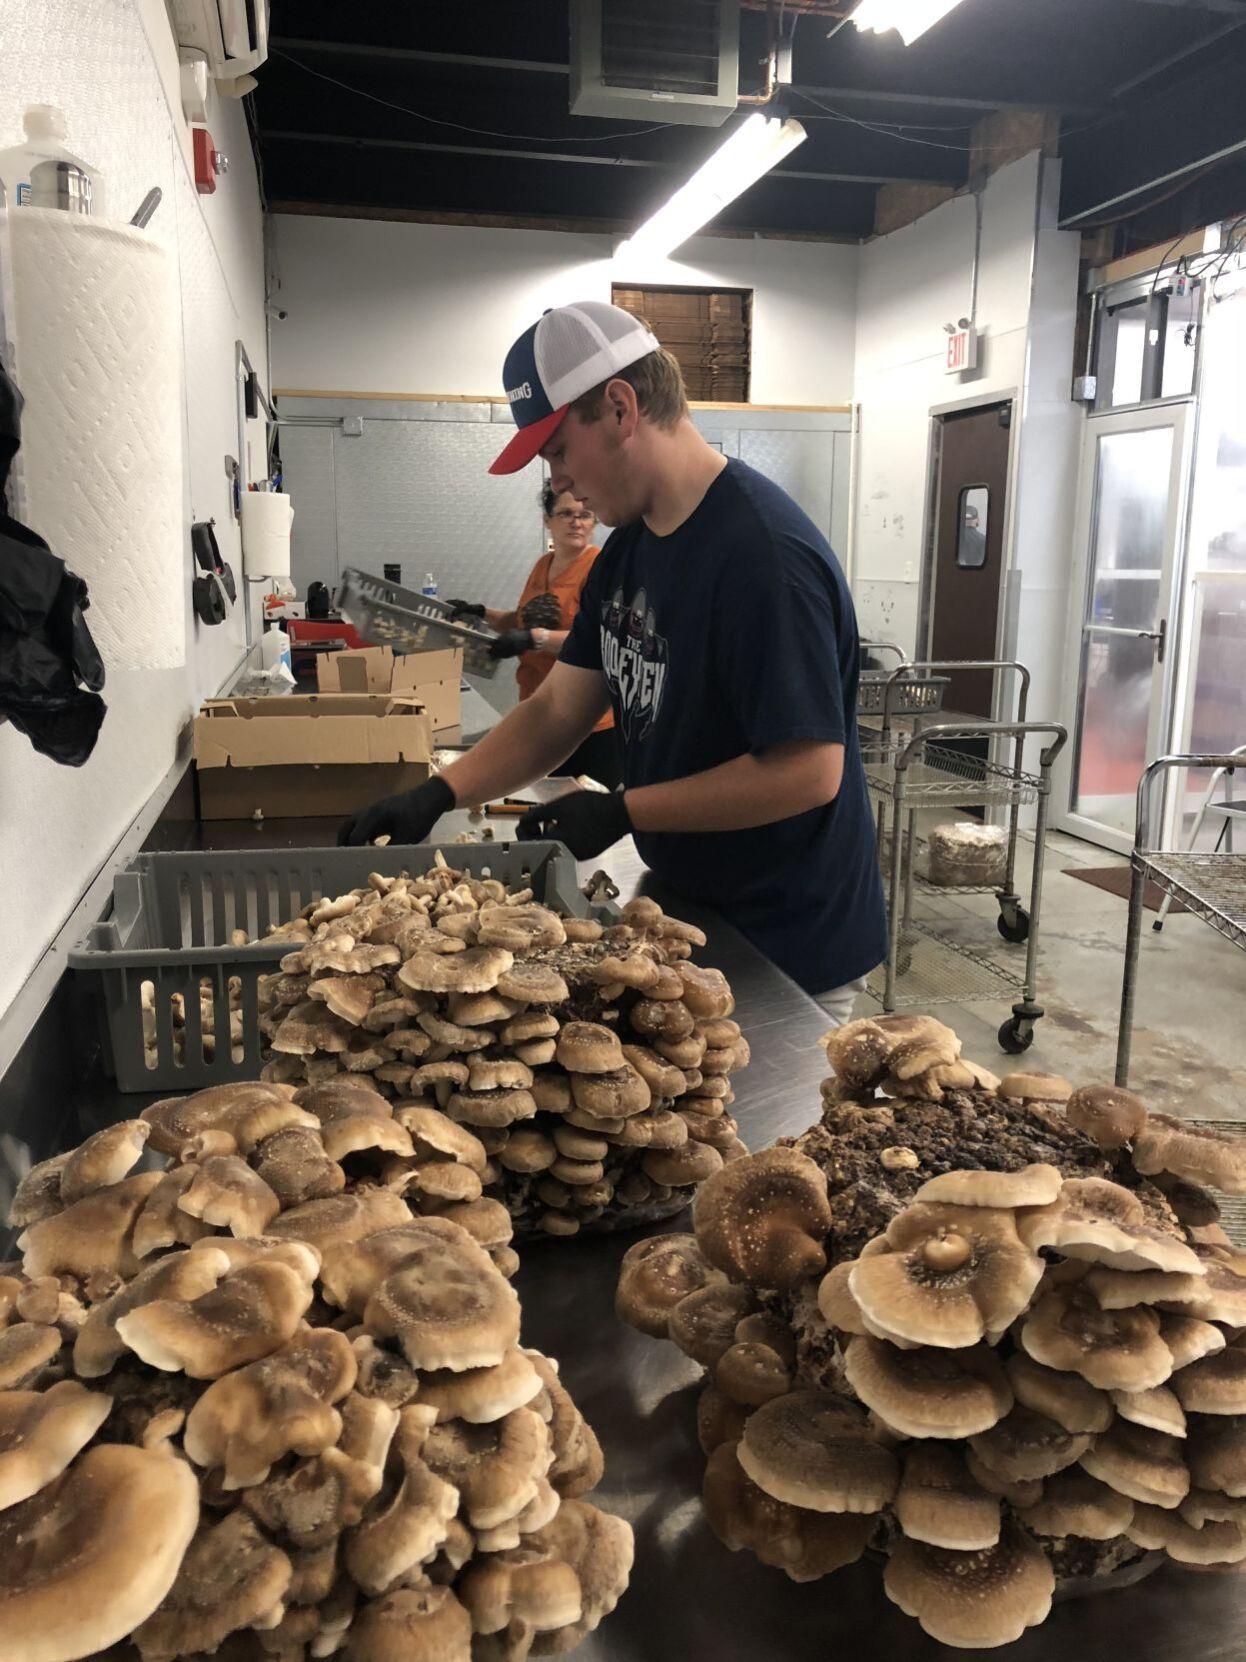 Preparing shiitake mushrooms